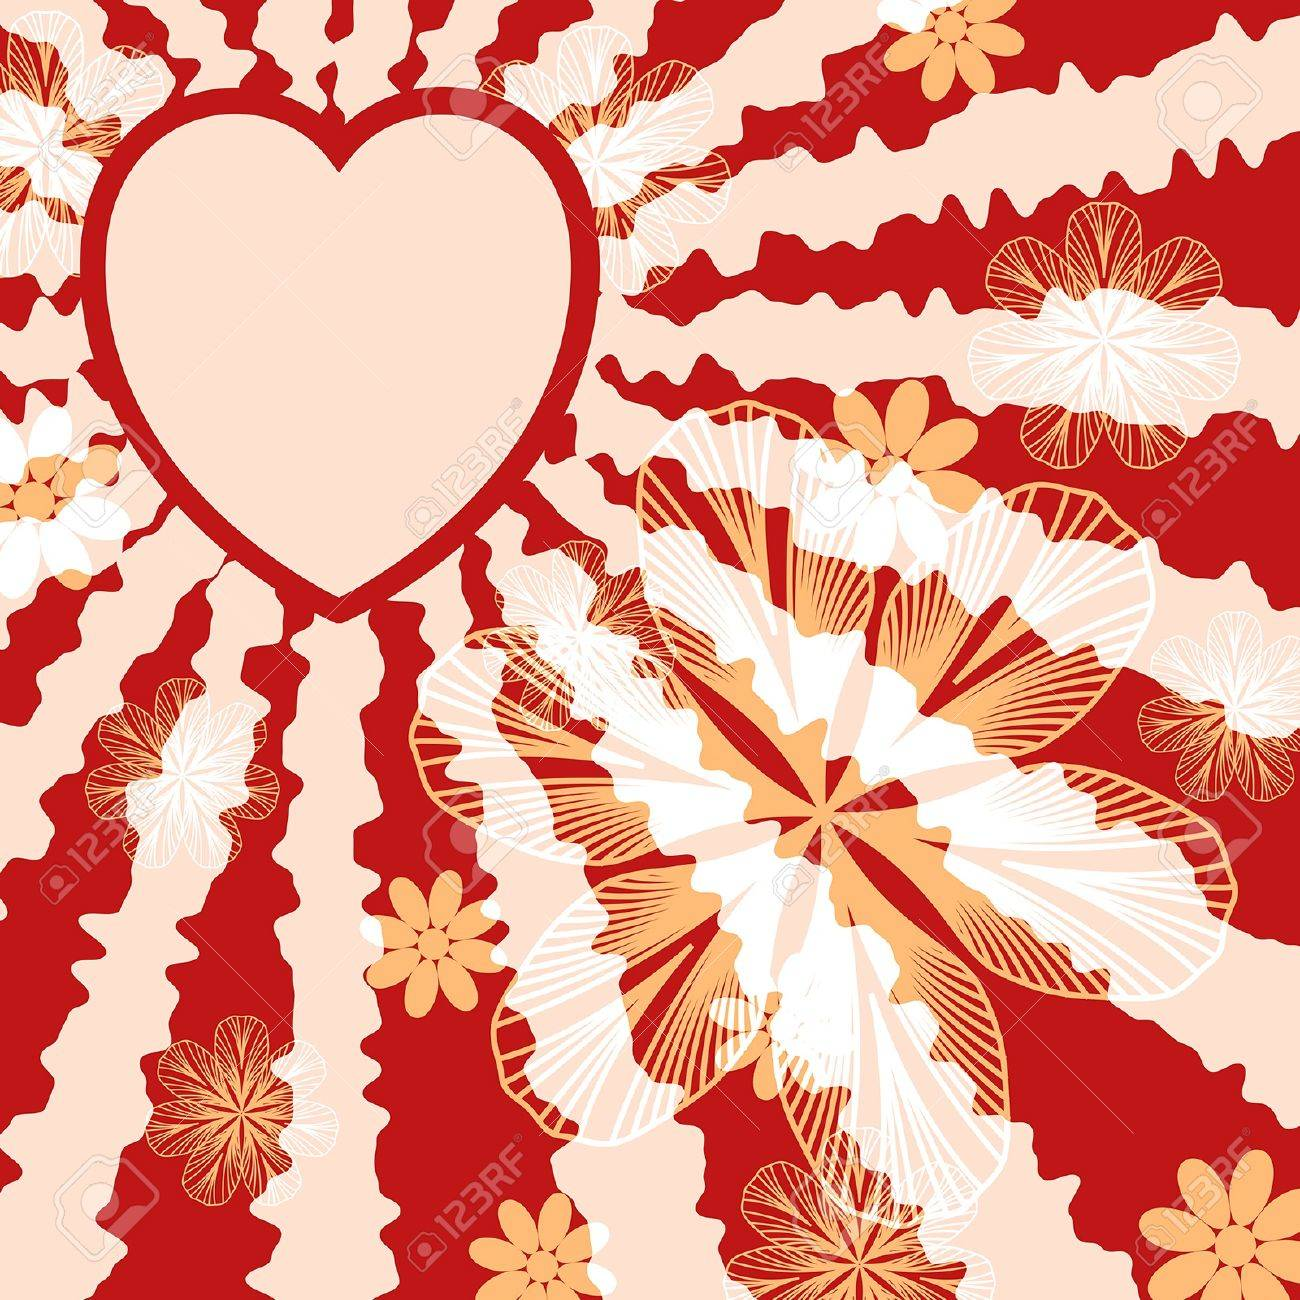 Red floral valentine background. EPS10 vector illustration. Stock Vector - 17667218